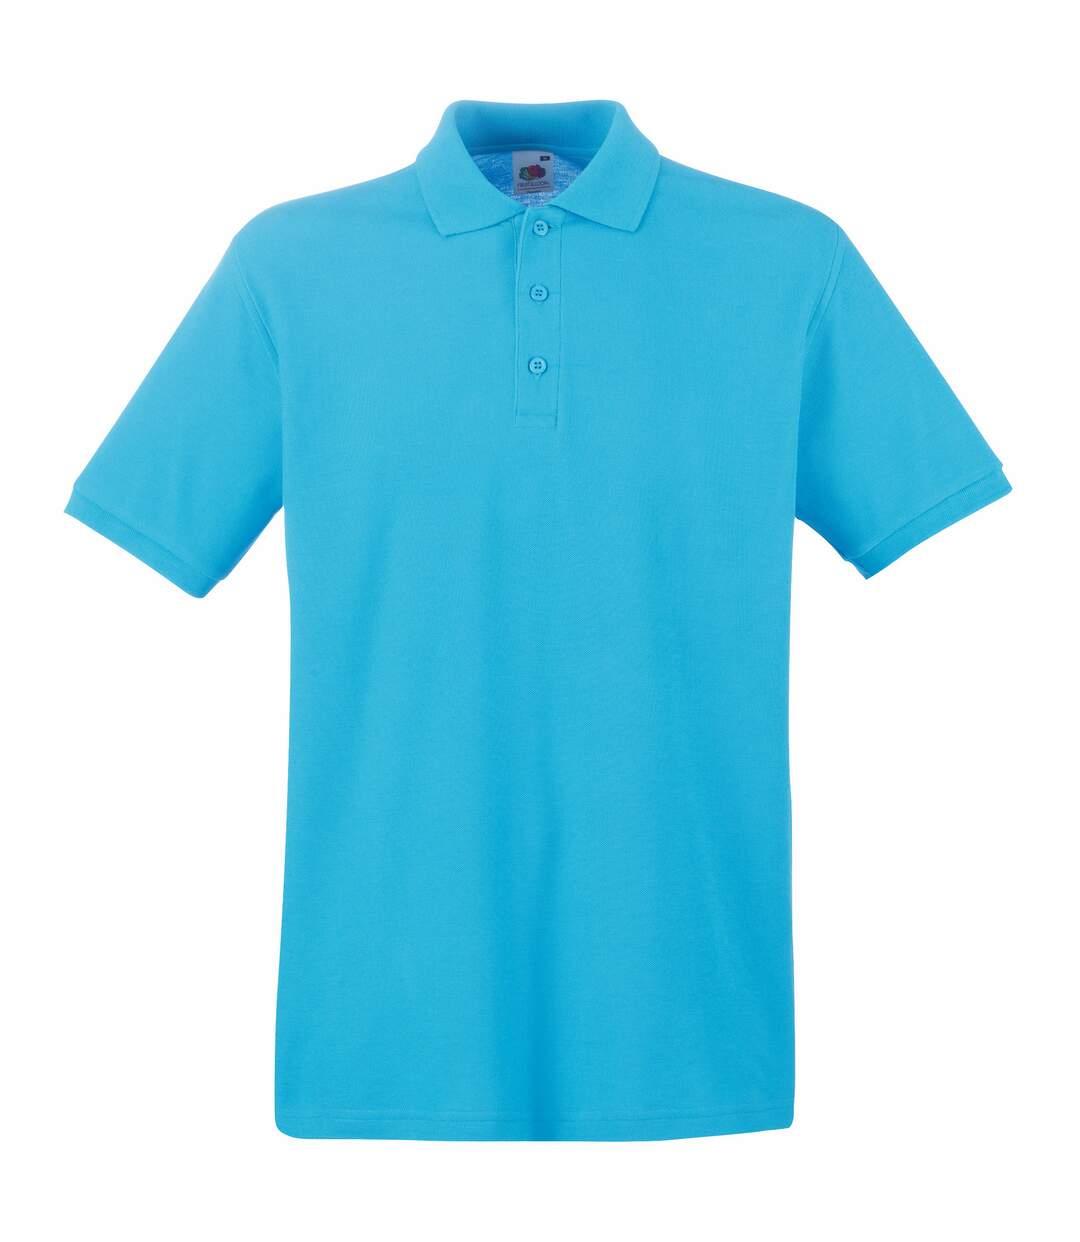 Fruit Of The Loom Premium Mens Short Sleeve Polo Shirt (Black) - UTBC1381